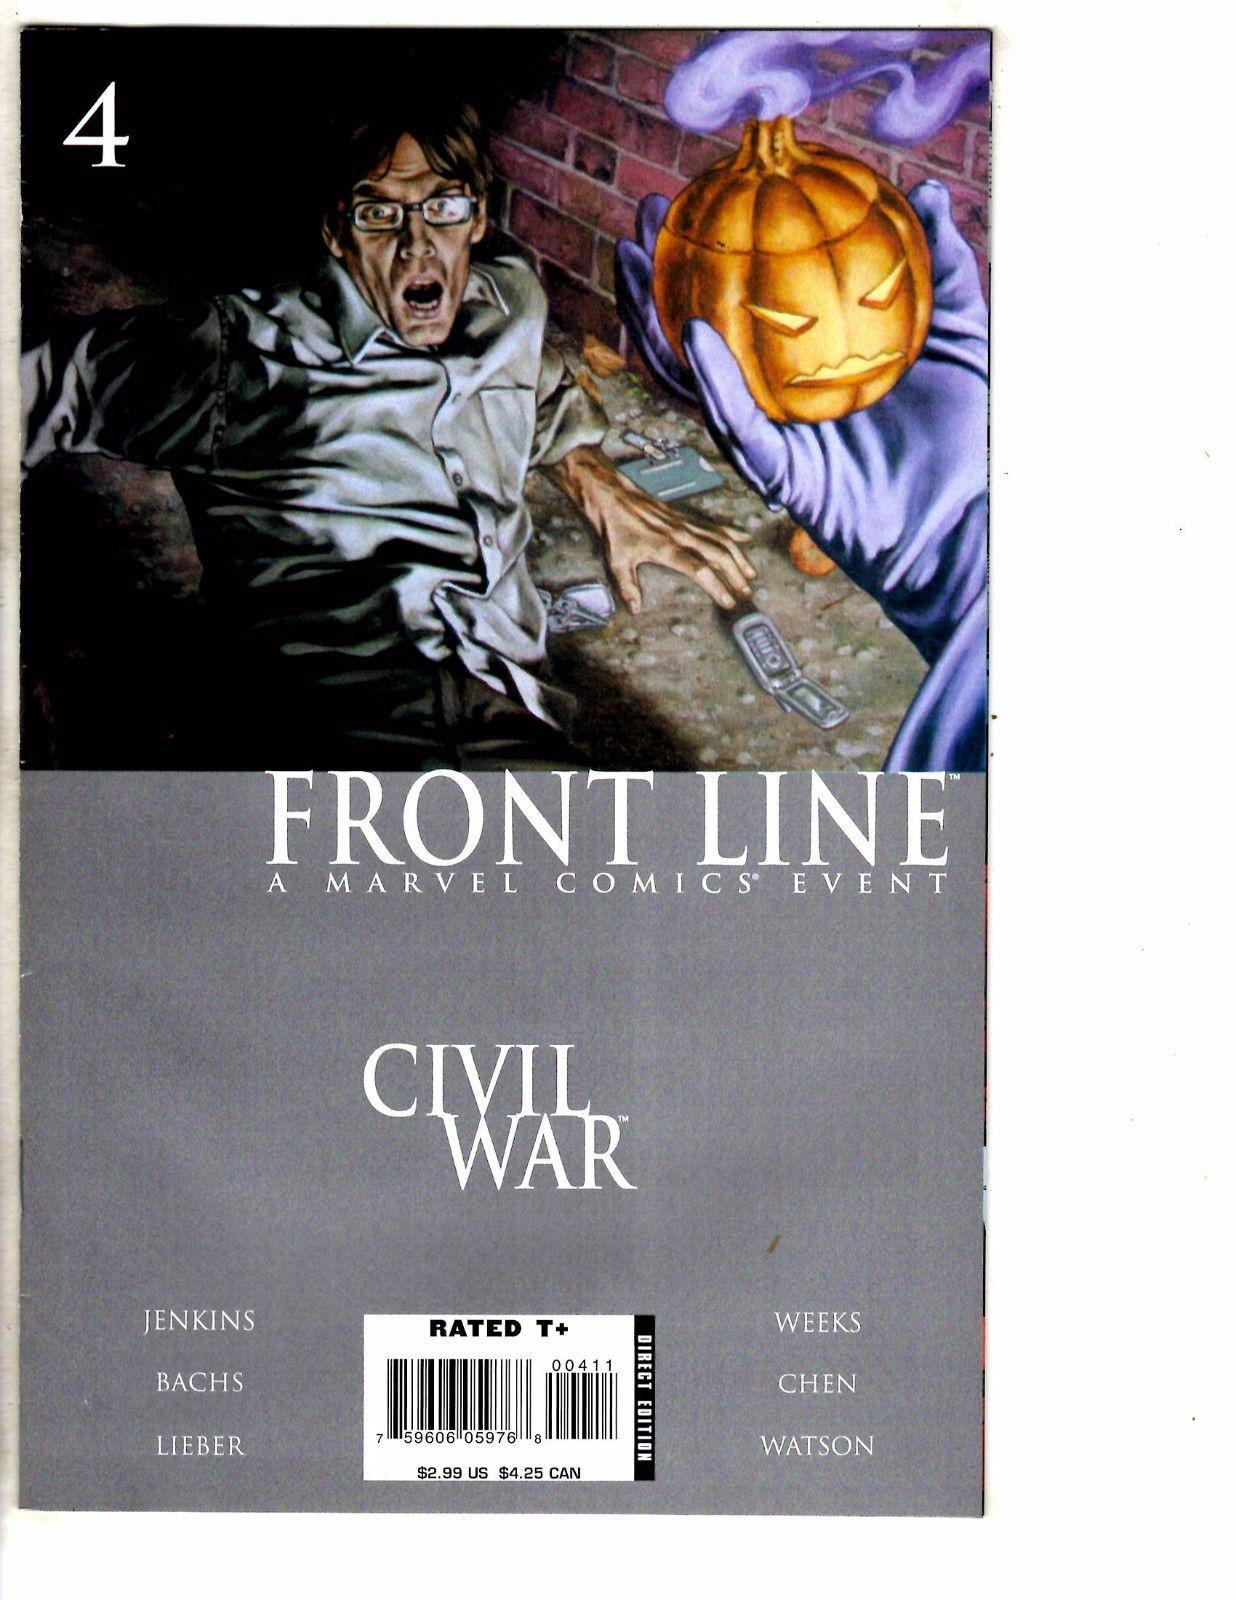 NM 2006 Marvel Comics CIVIL WAR FRONT LINE #4 of 11